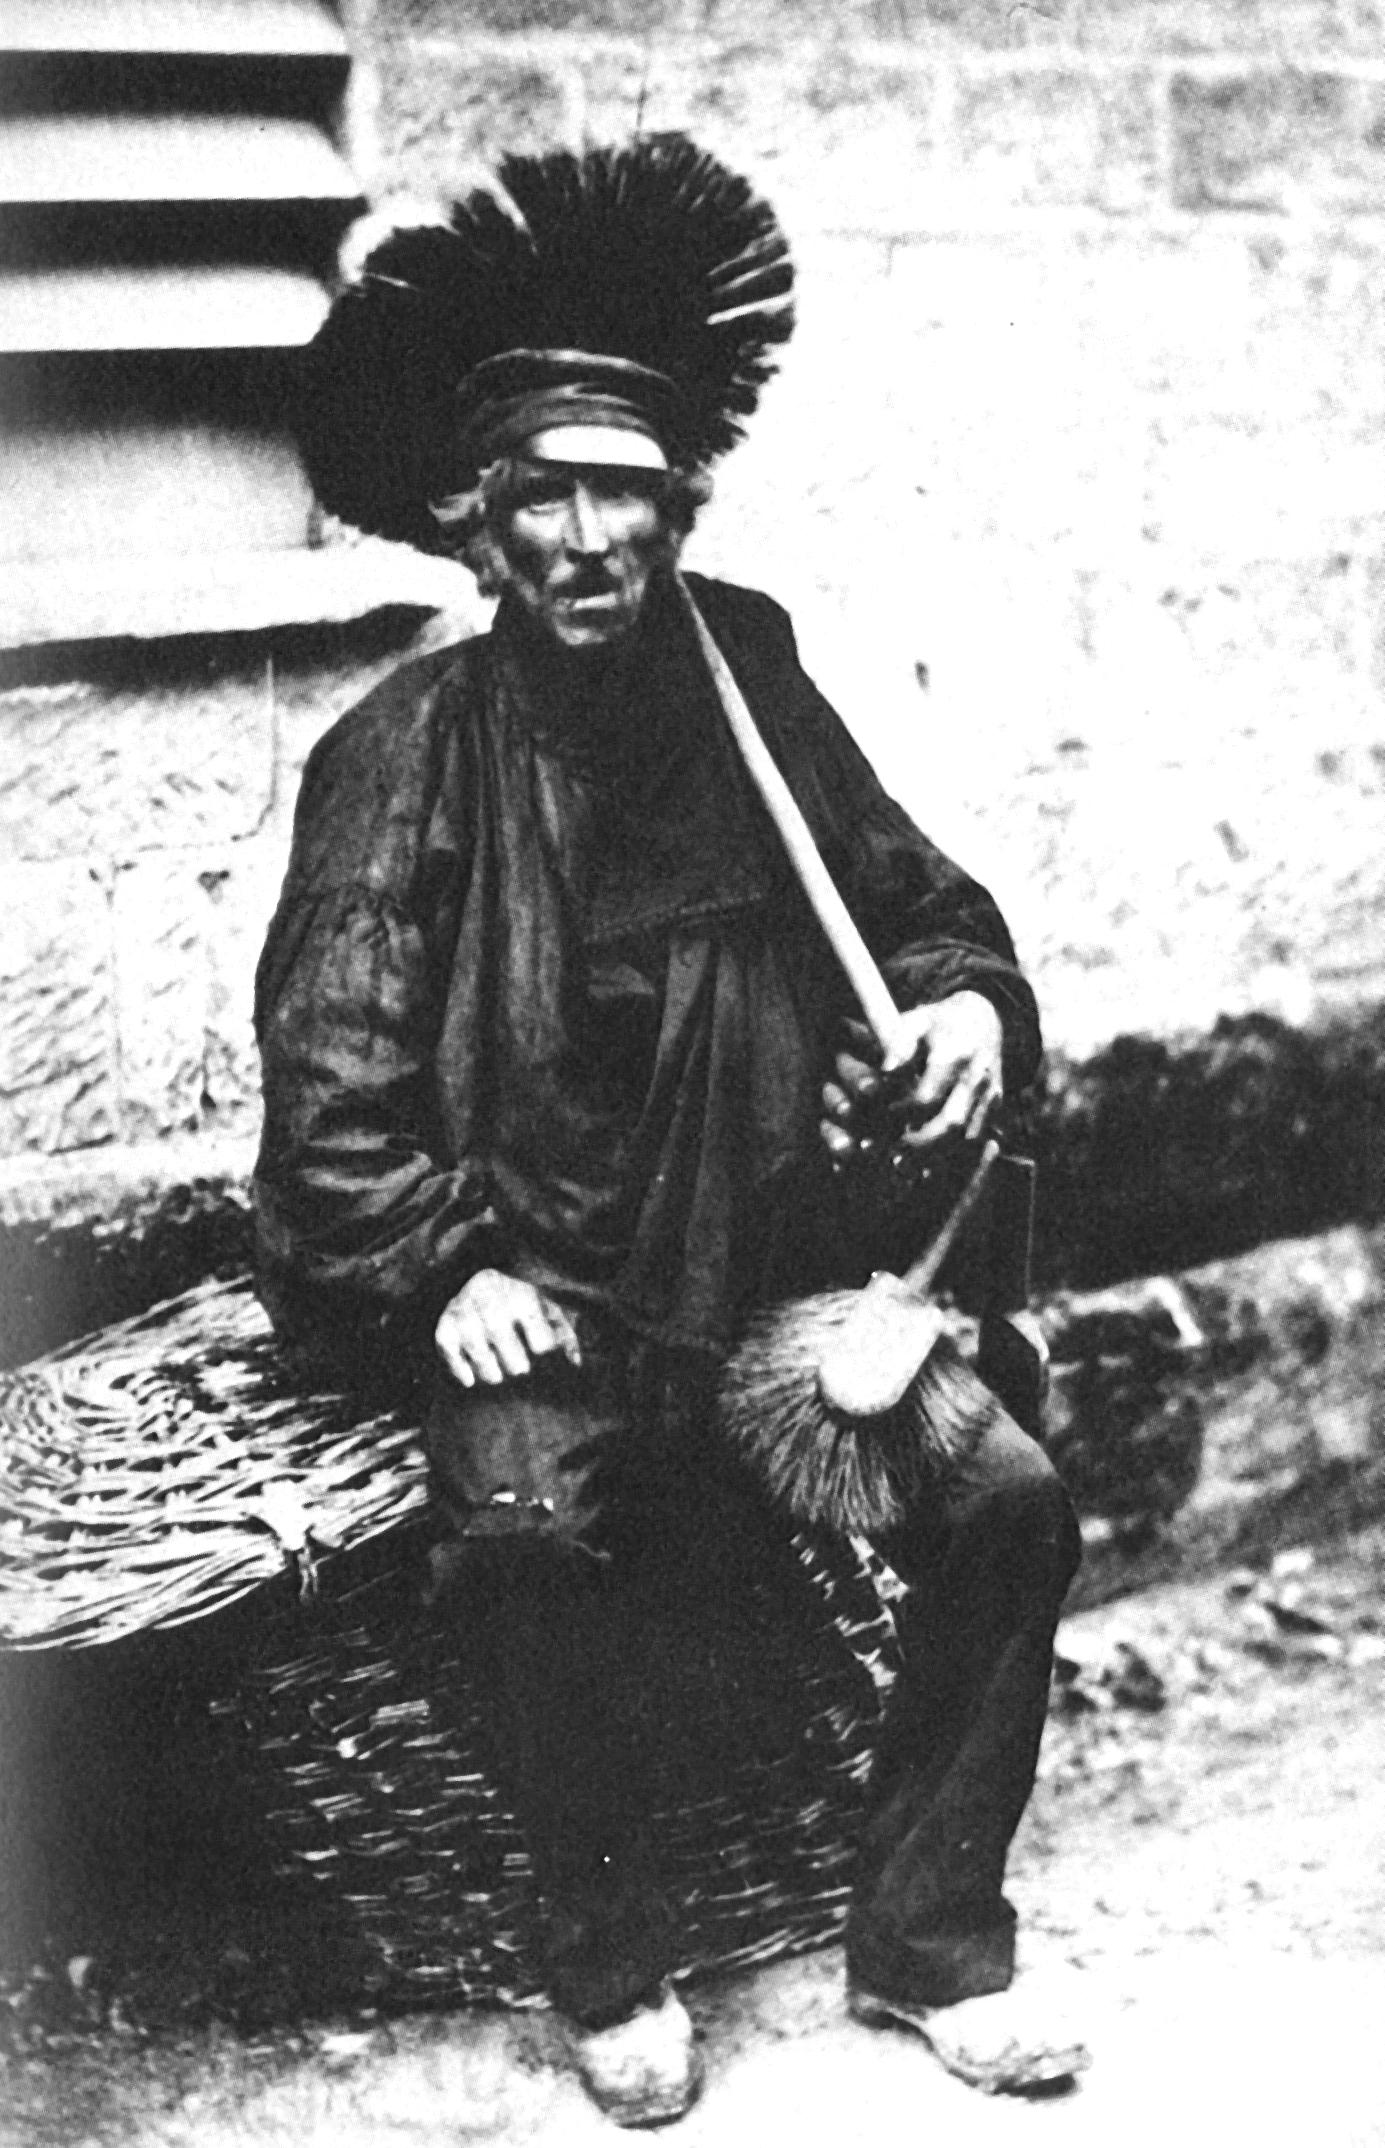 Chimney sweepDate1850s